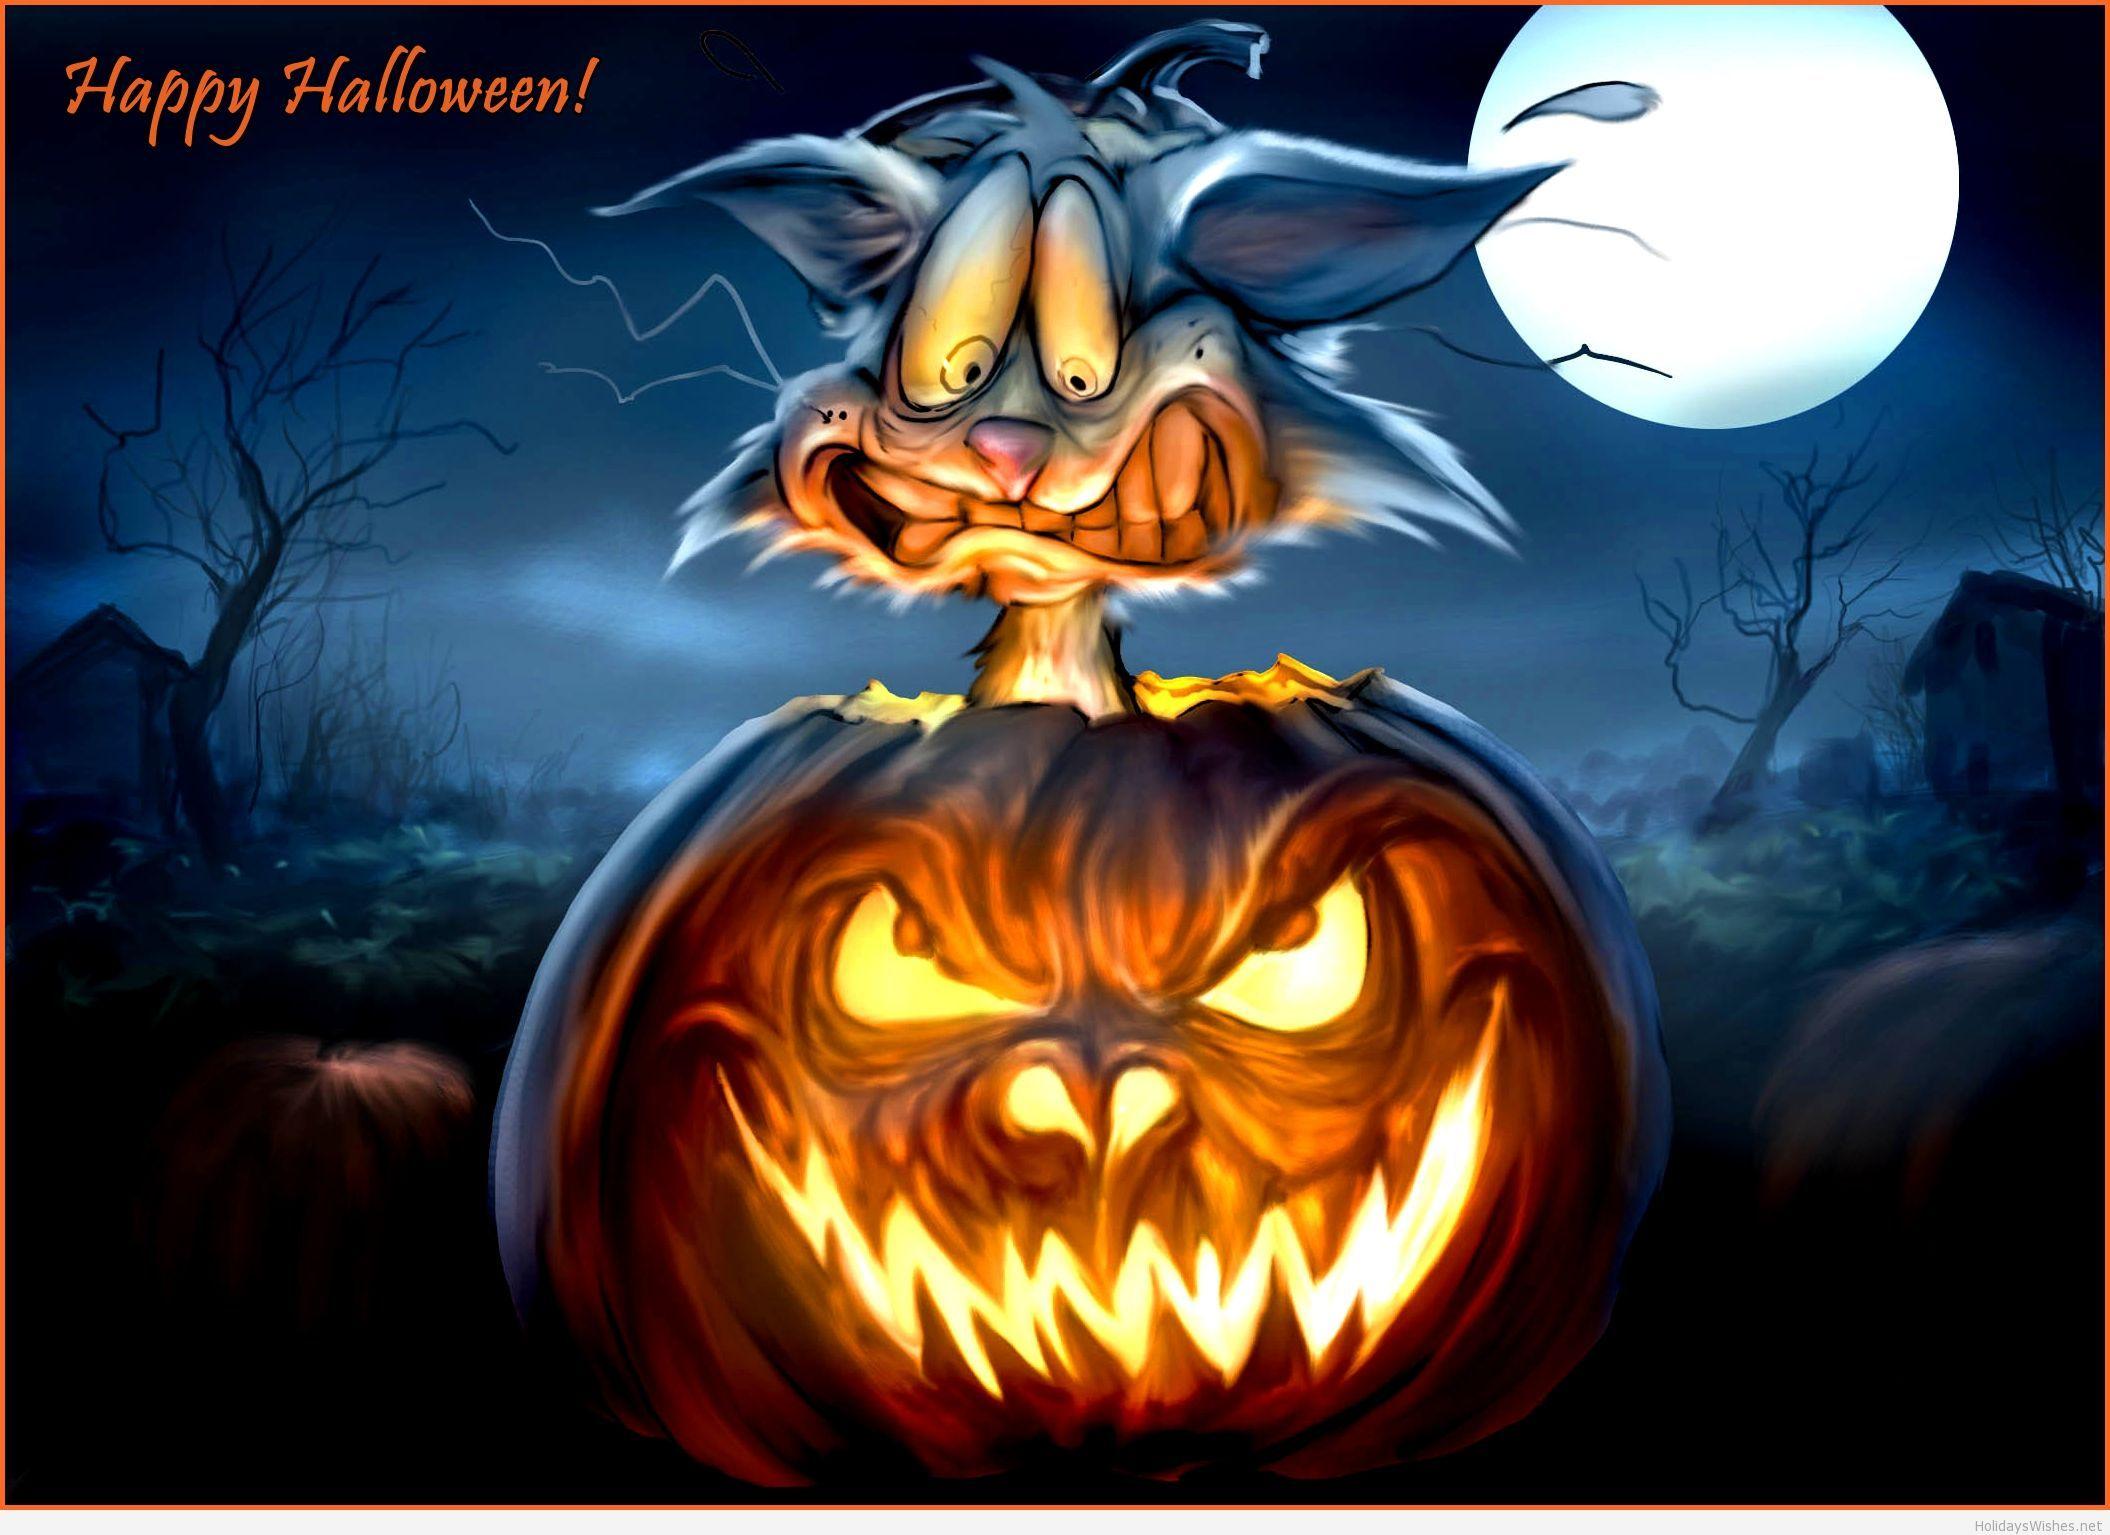 Funny Halloween party 2014 Halloween, Hd wallpaper